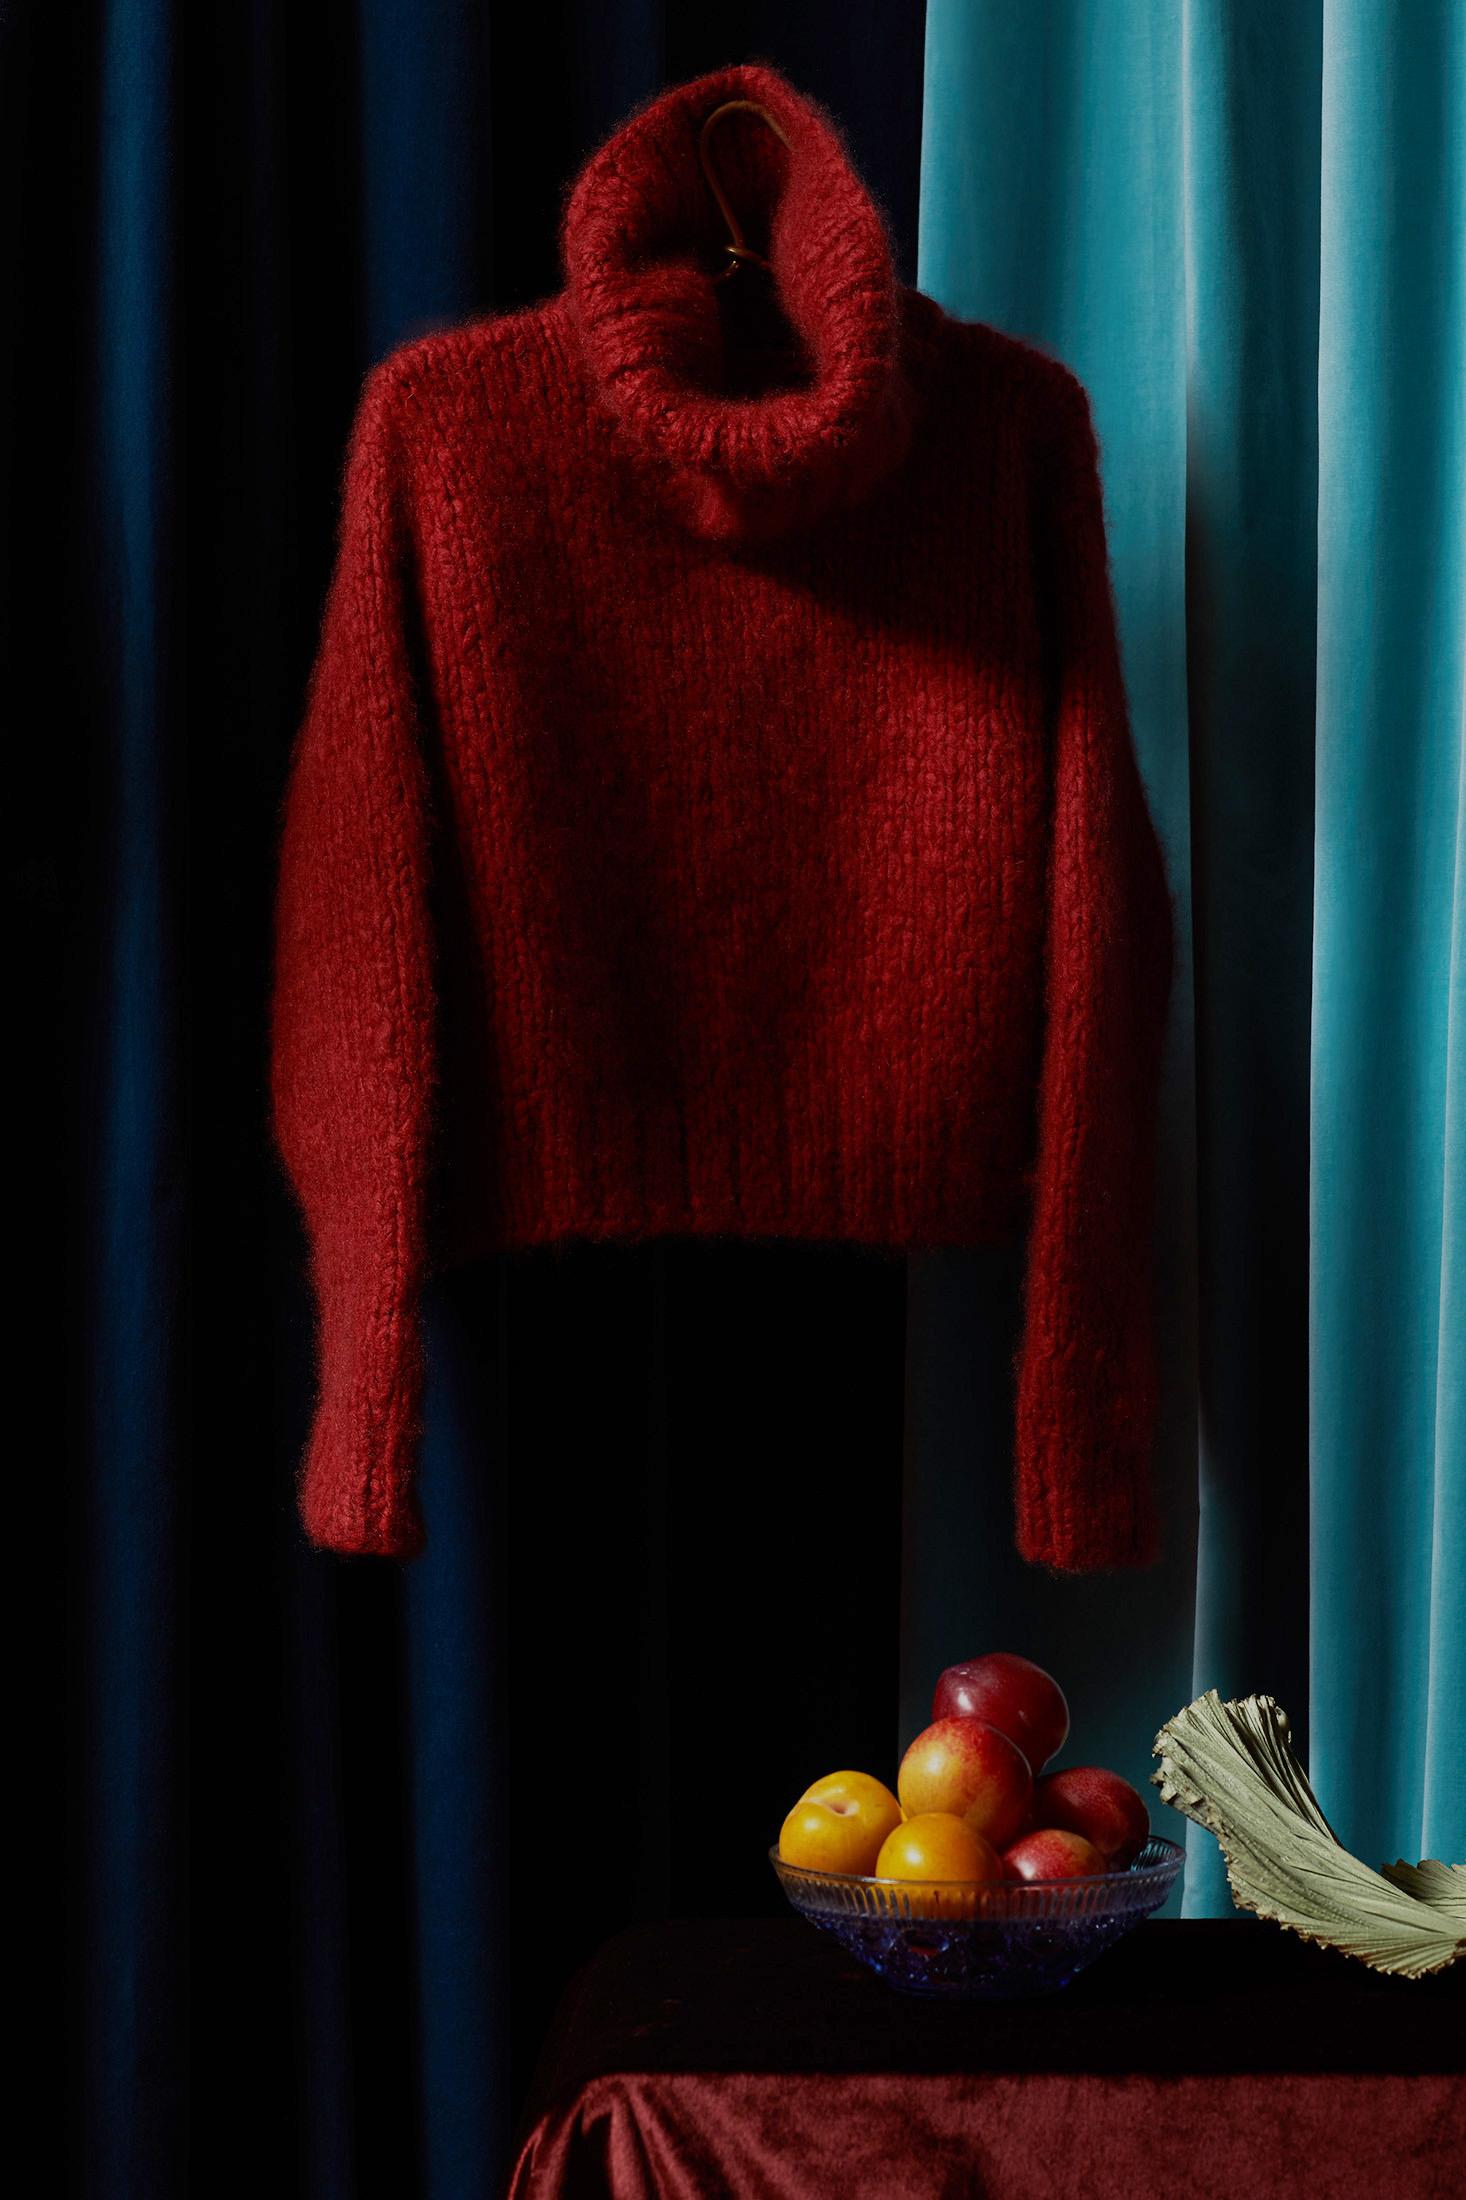 01_IAS_Red_Sweater_StillLife_033.jpg